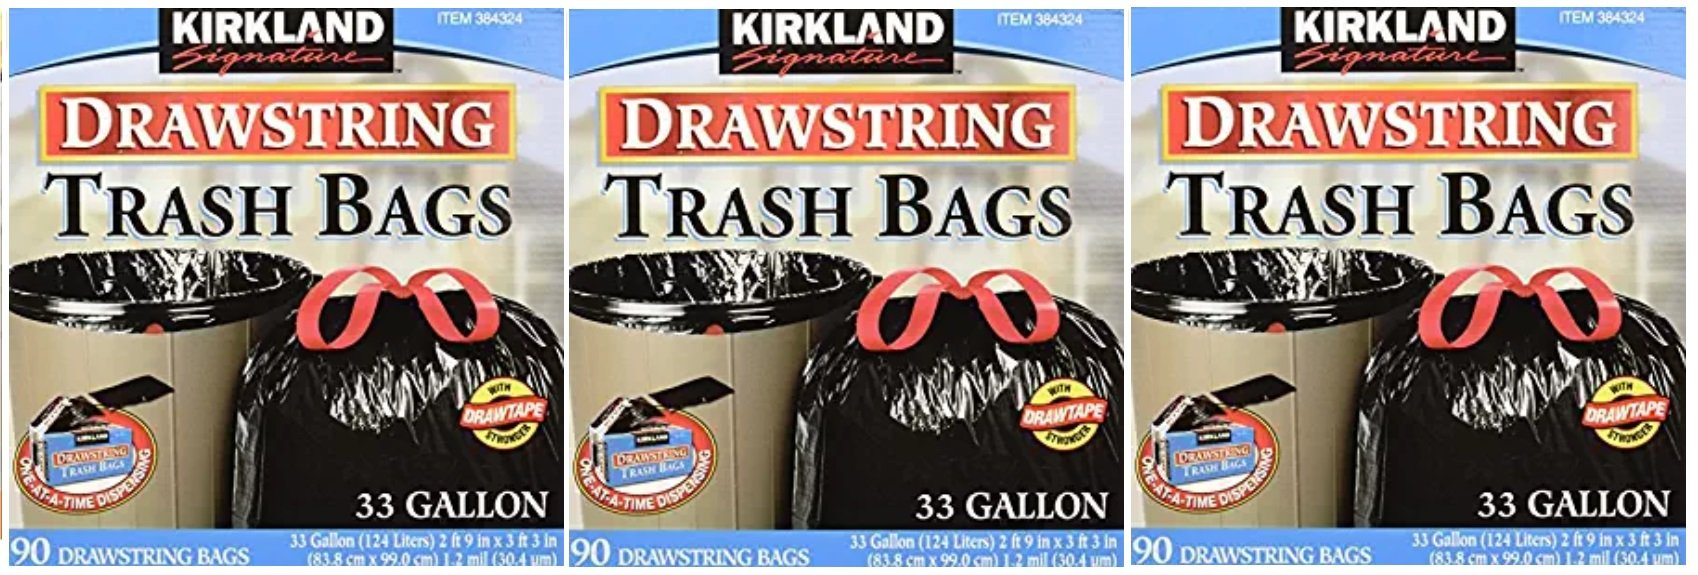 Kirkland Signature Drawstring Trash Bags - 33 Gallon - Xl Size - 3 Pack (90 count)